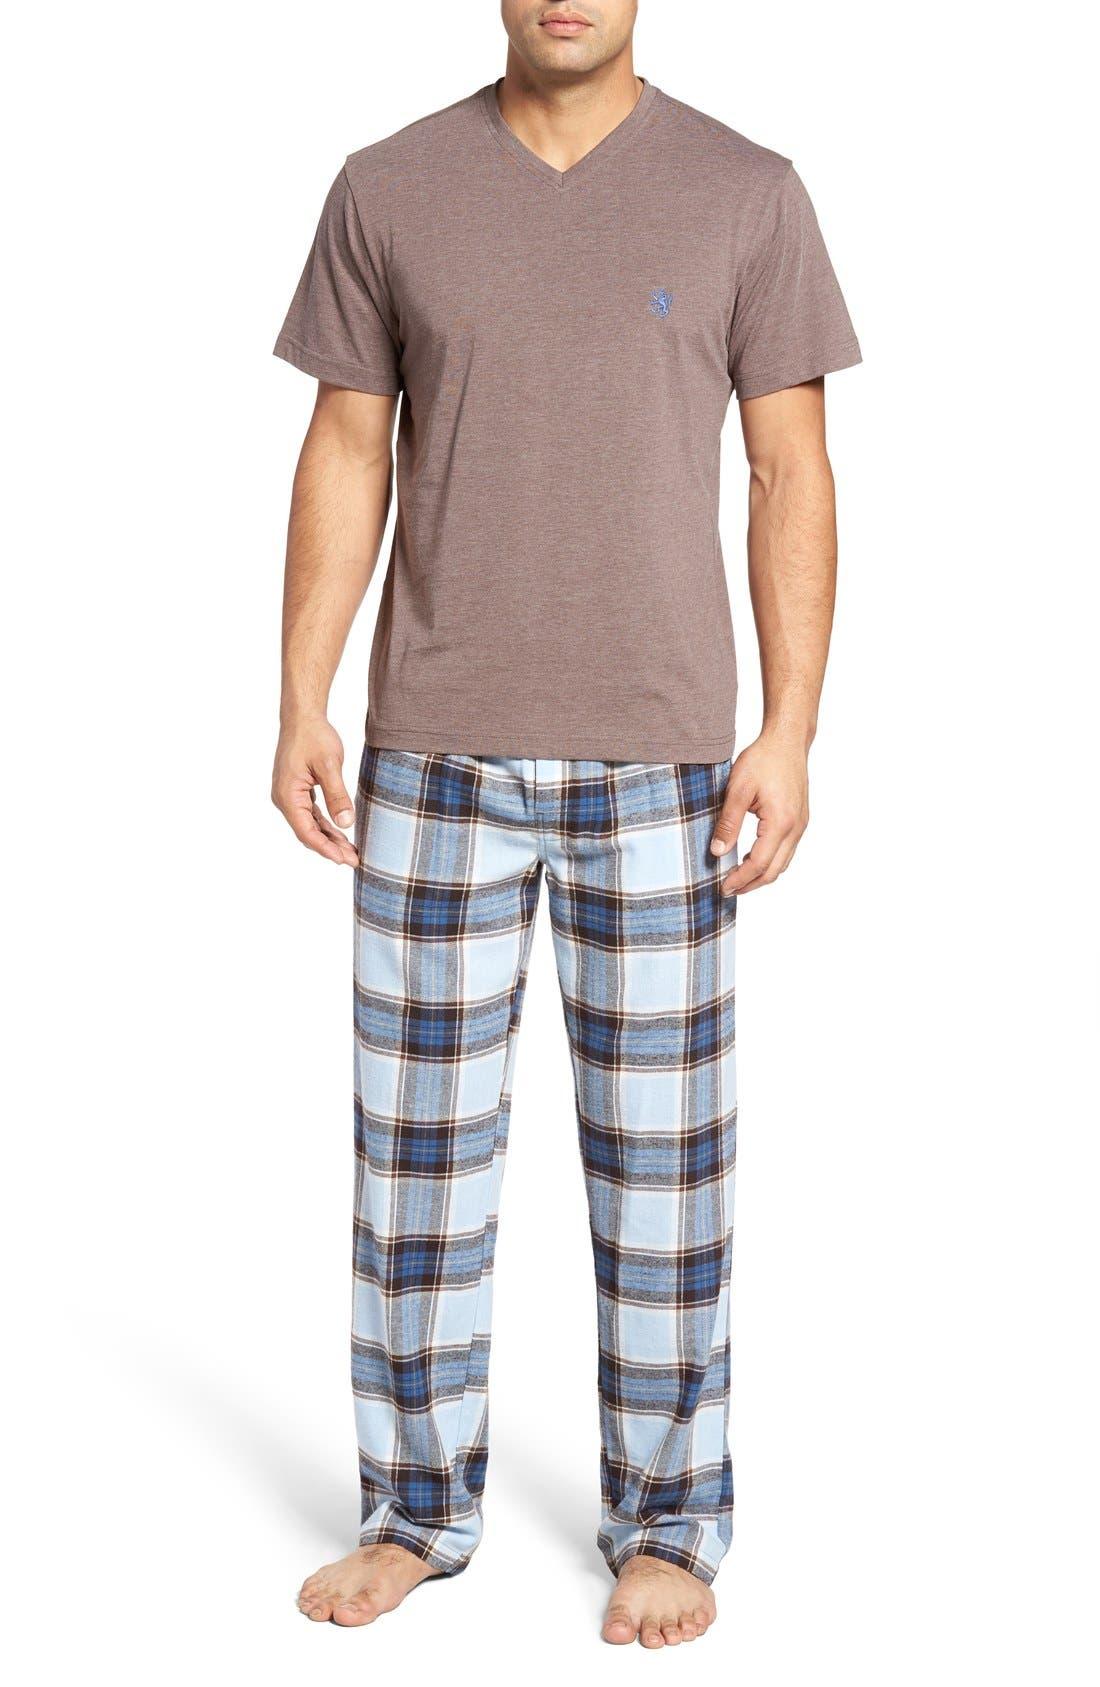 Alternate Image 1 Selected - Majestic International T-Shirt & Lounge Pants